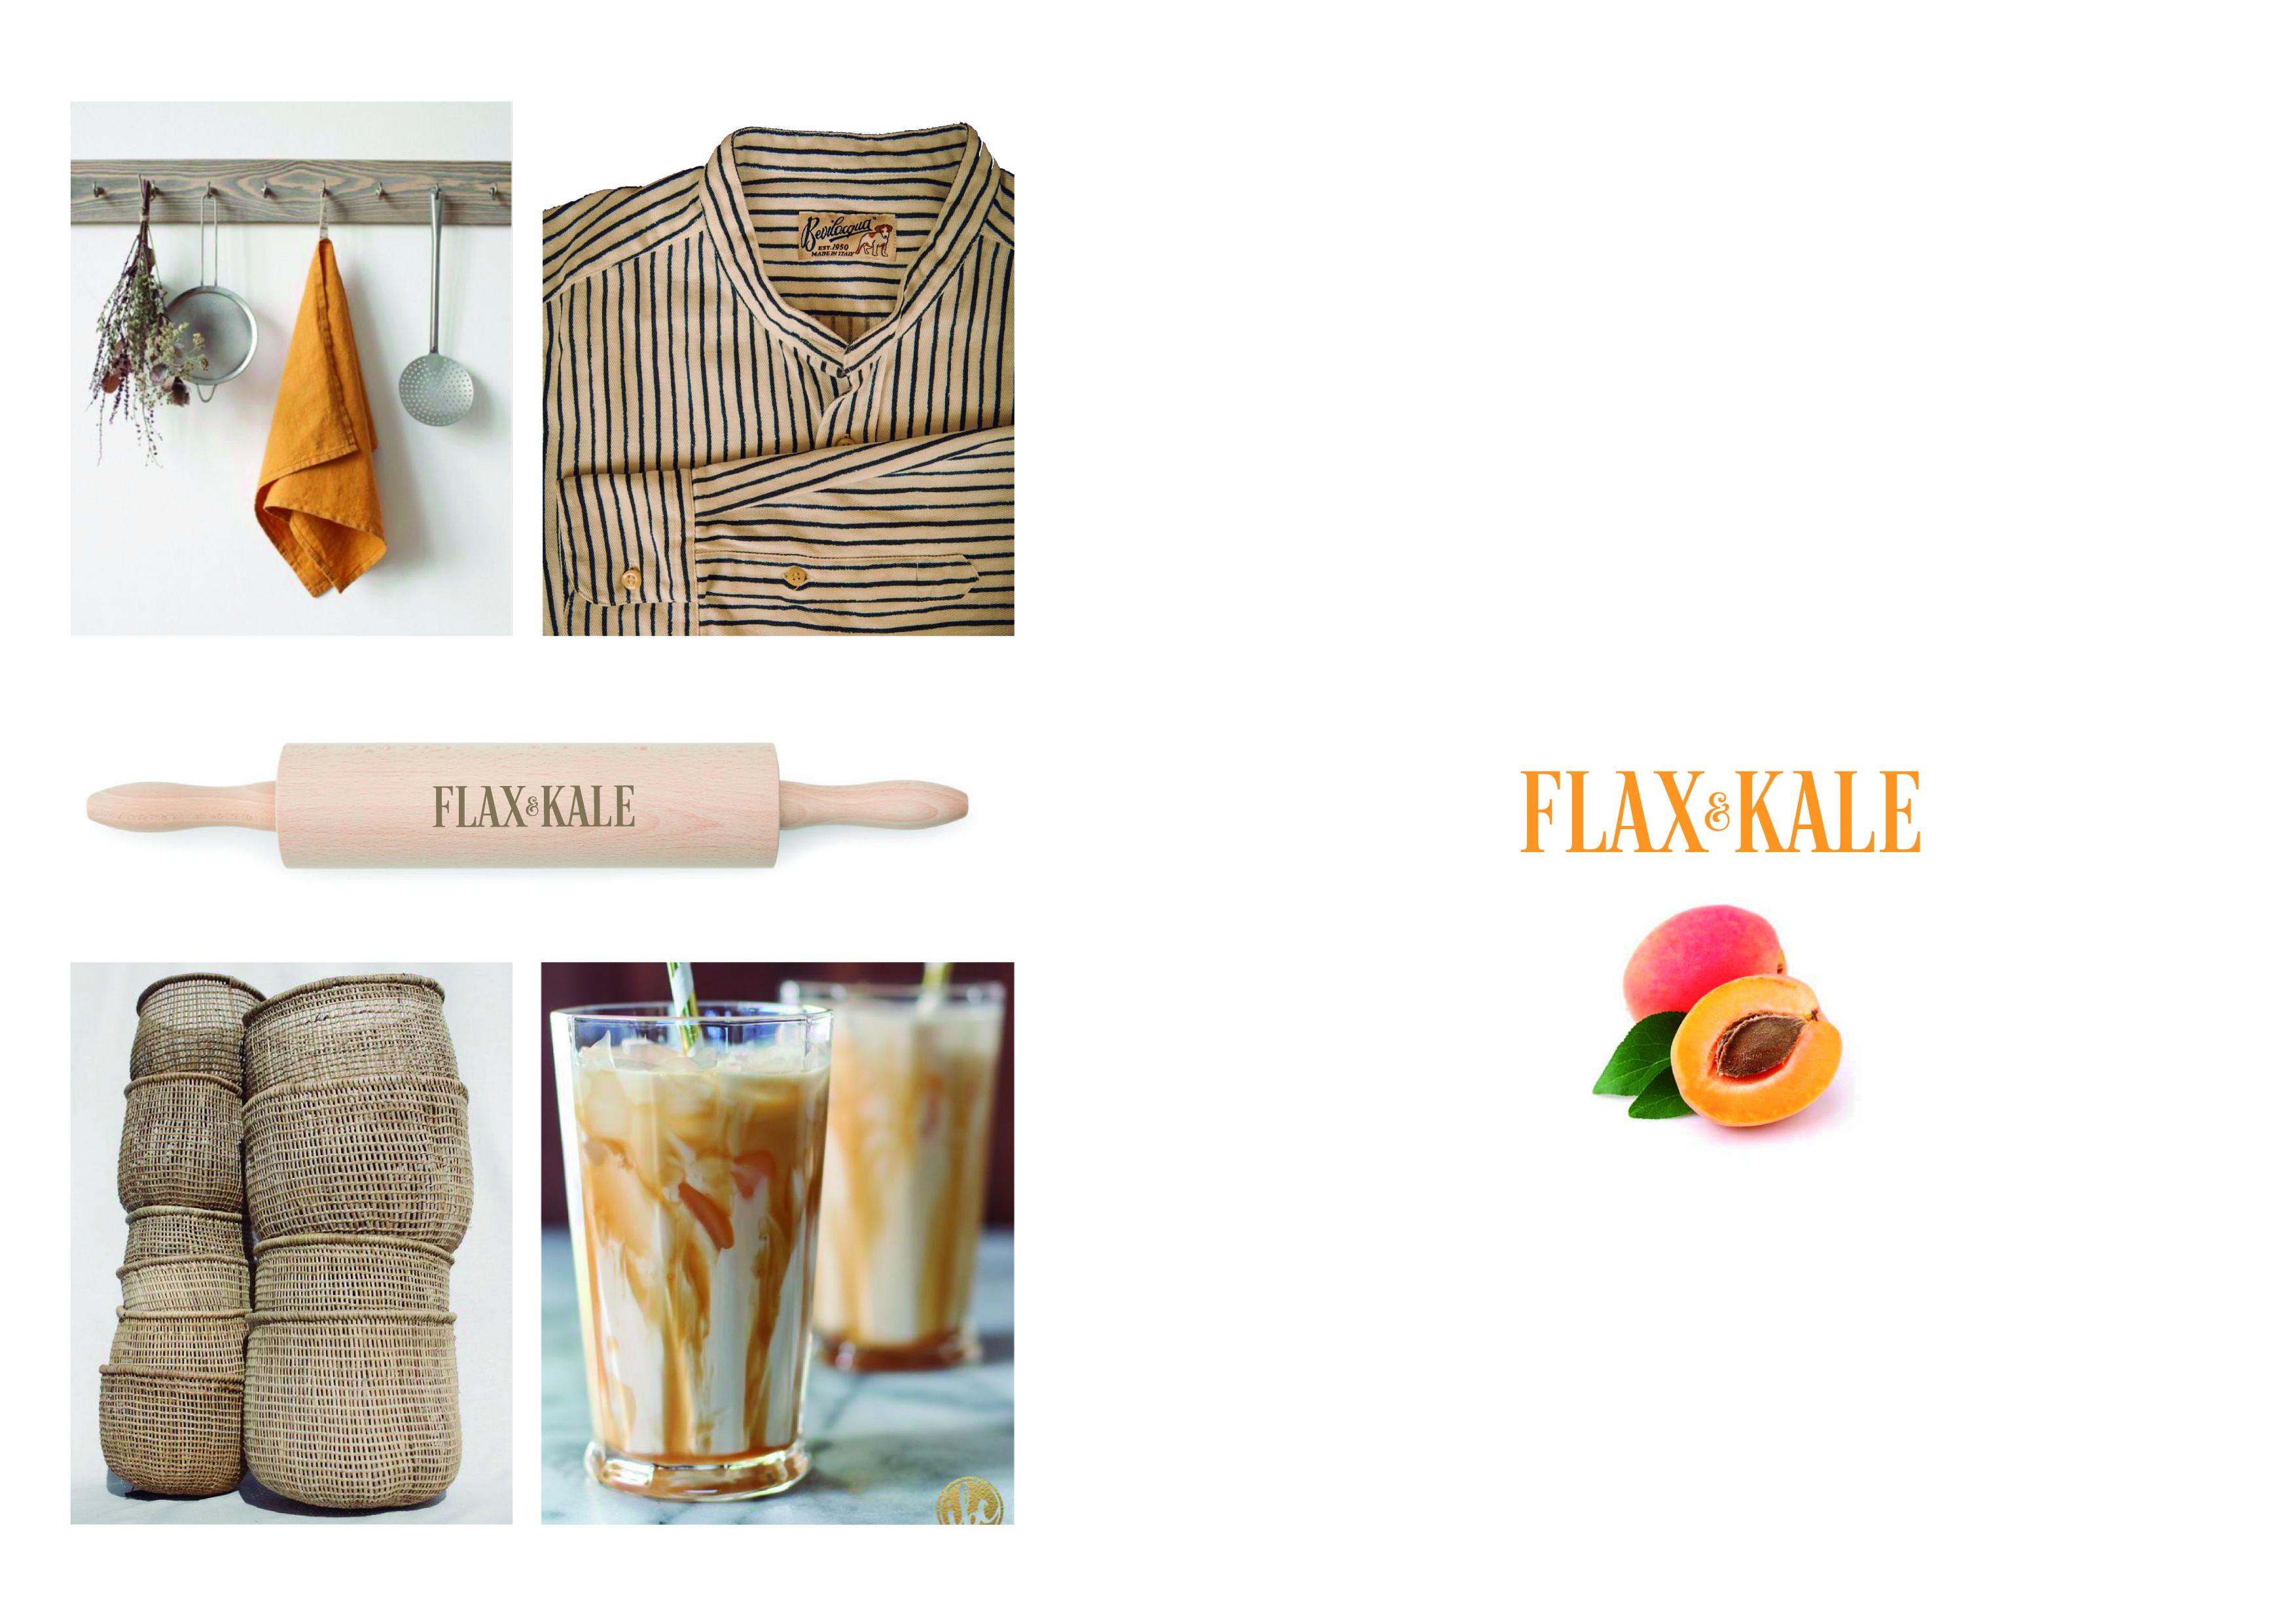 FLAX&KALE FINAL-05